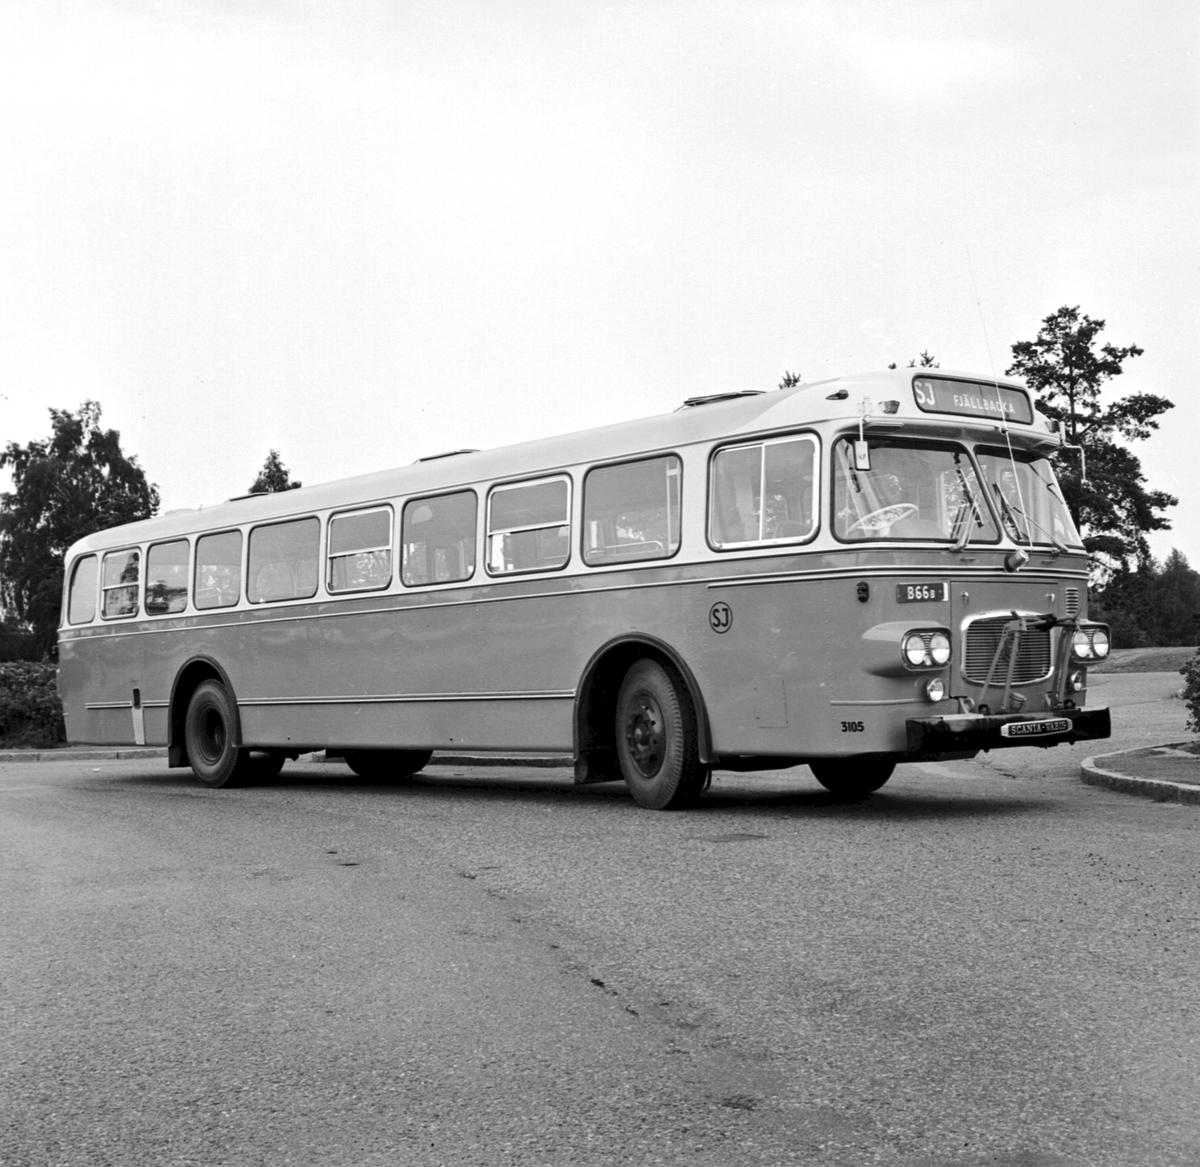 Leveransfoto. Scania Vabis. Typ CF 6561 SJ 3105. Destination Fjällbacka